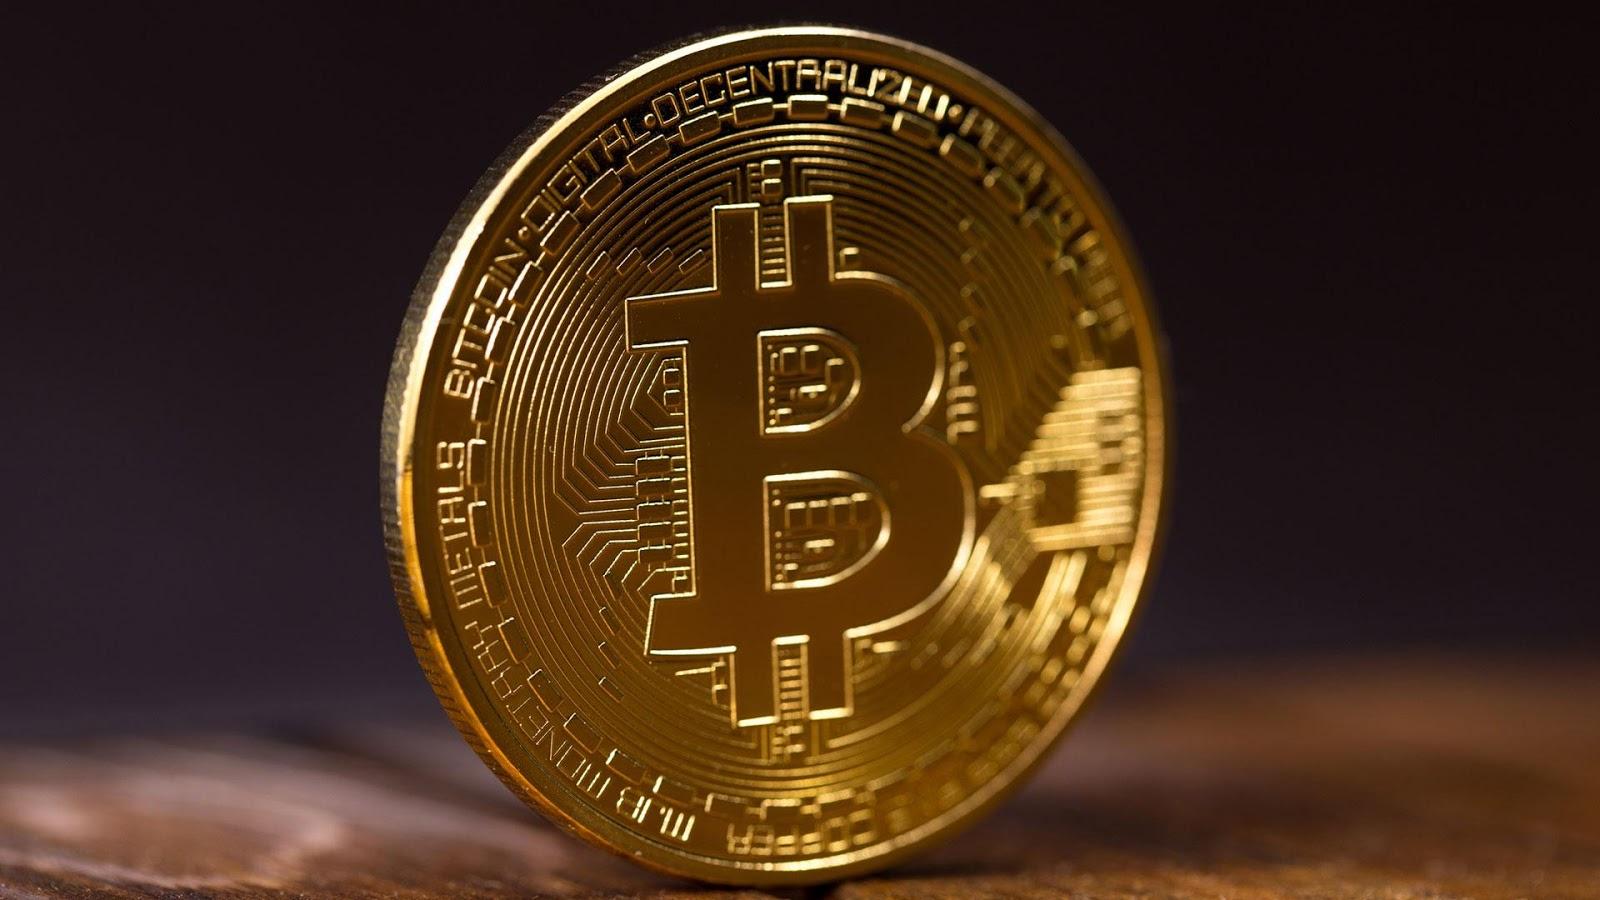 bitcoin computer hd wallpaper 62351